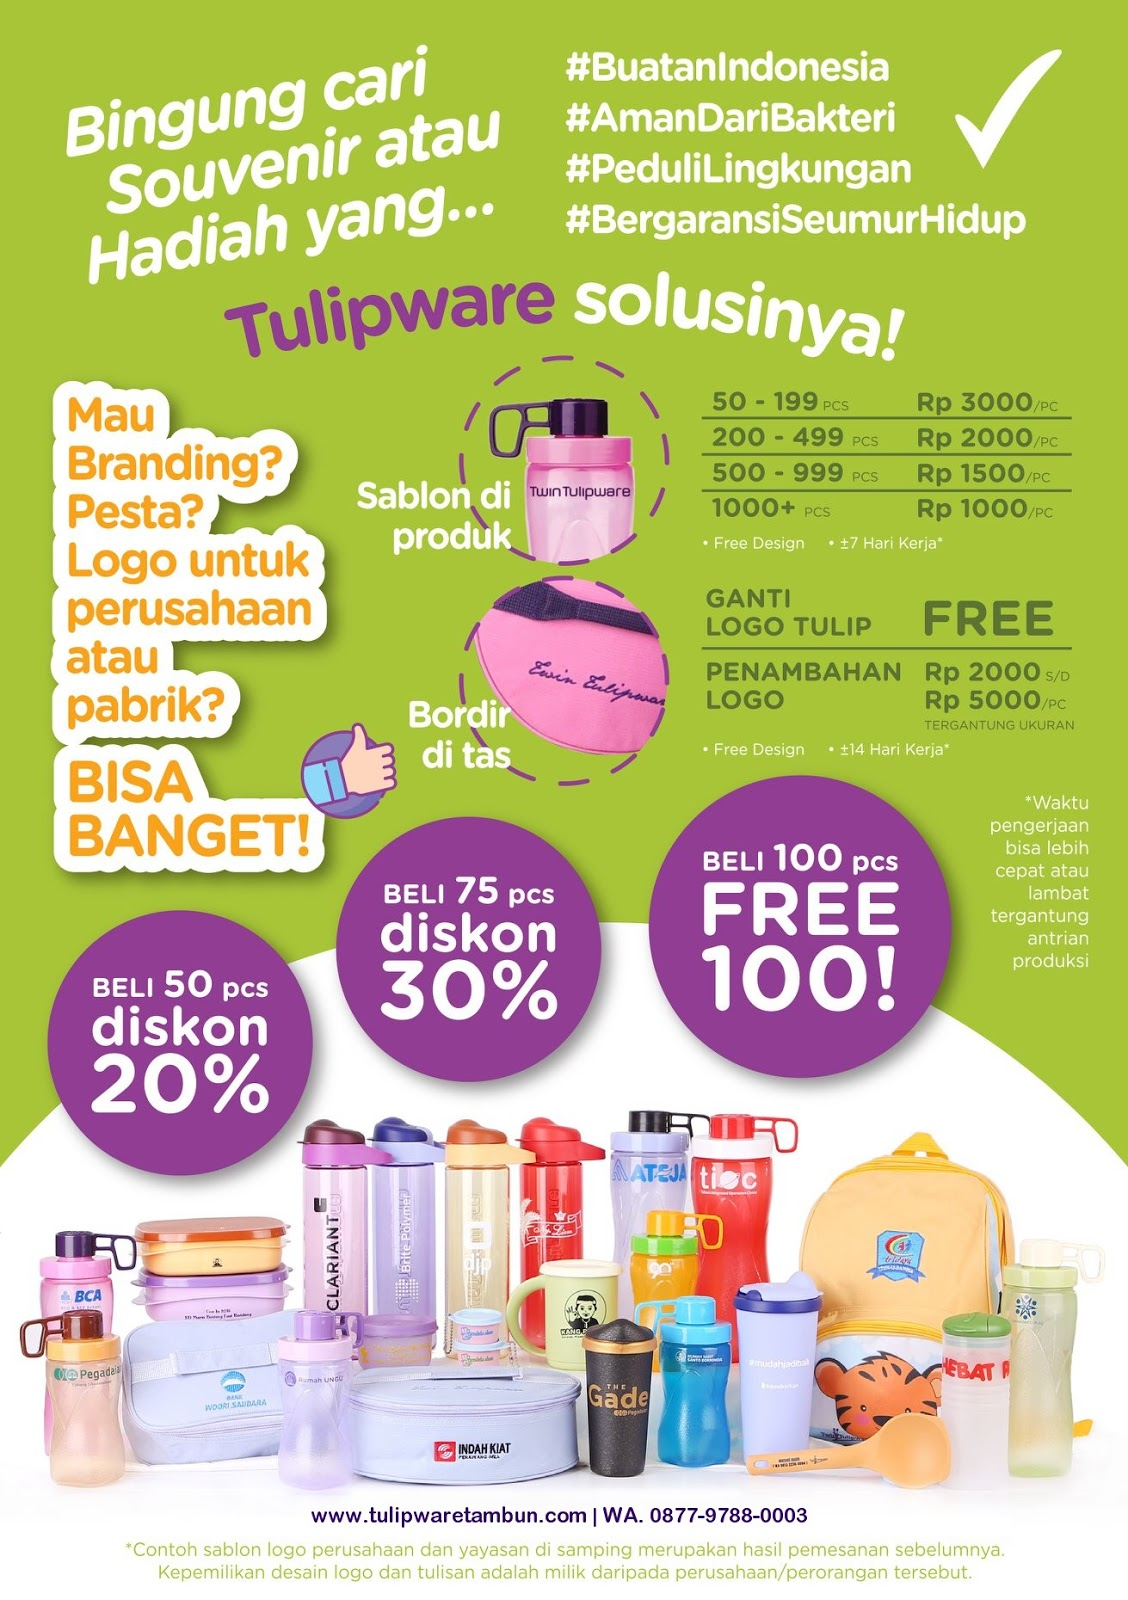 Promo Tulipware Corporate